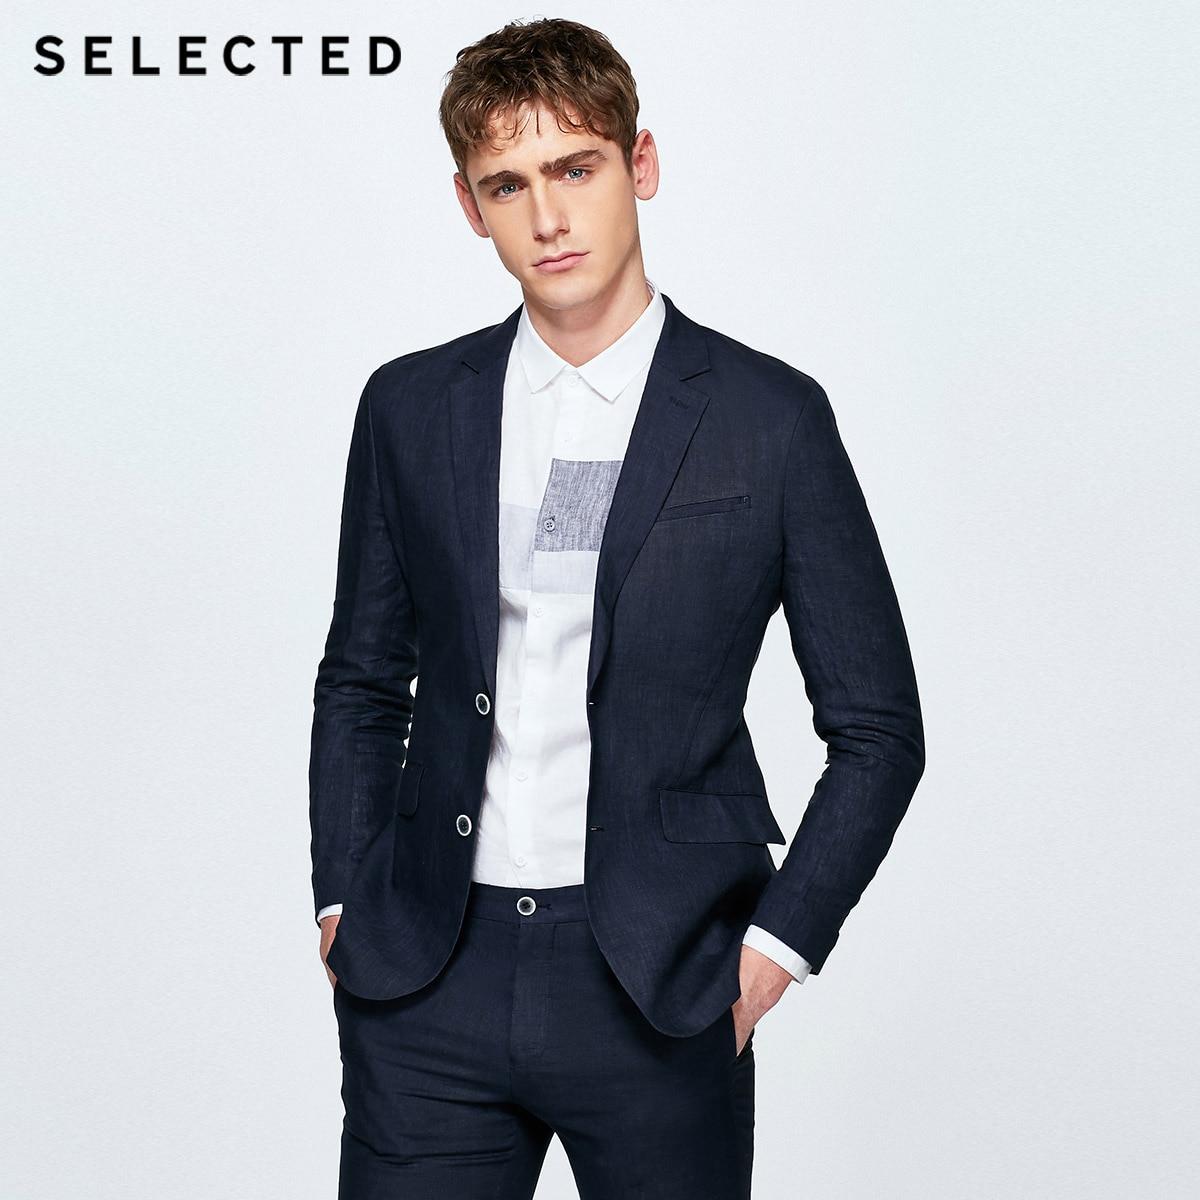 SELECTED Men's Flax Regular Slim-Fit Blazer 100% Linen Business Casual Jacket Clothes S   418272503